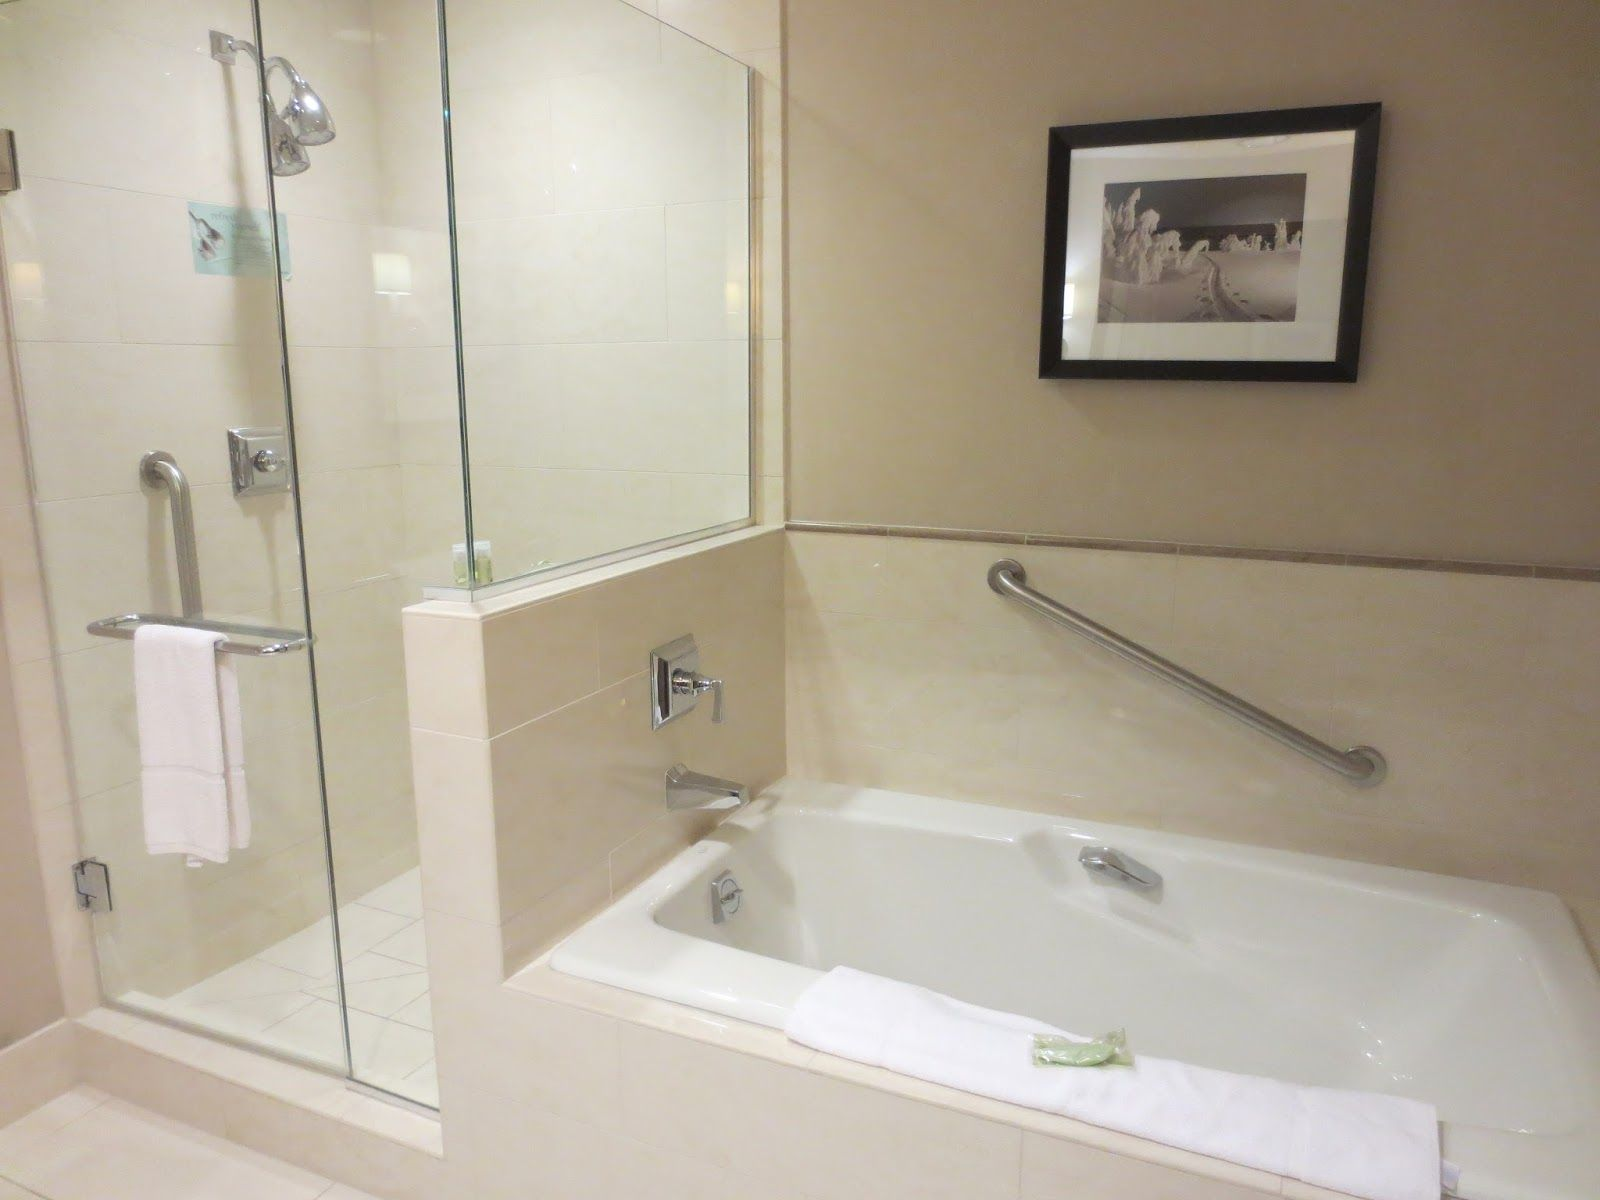 Cozy Kohler Shower Base For Your Bathroom Design Ideas Best